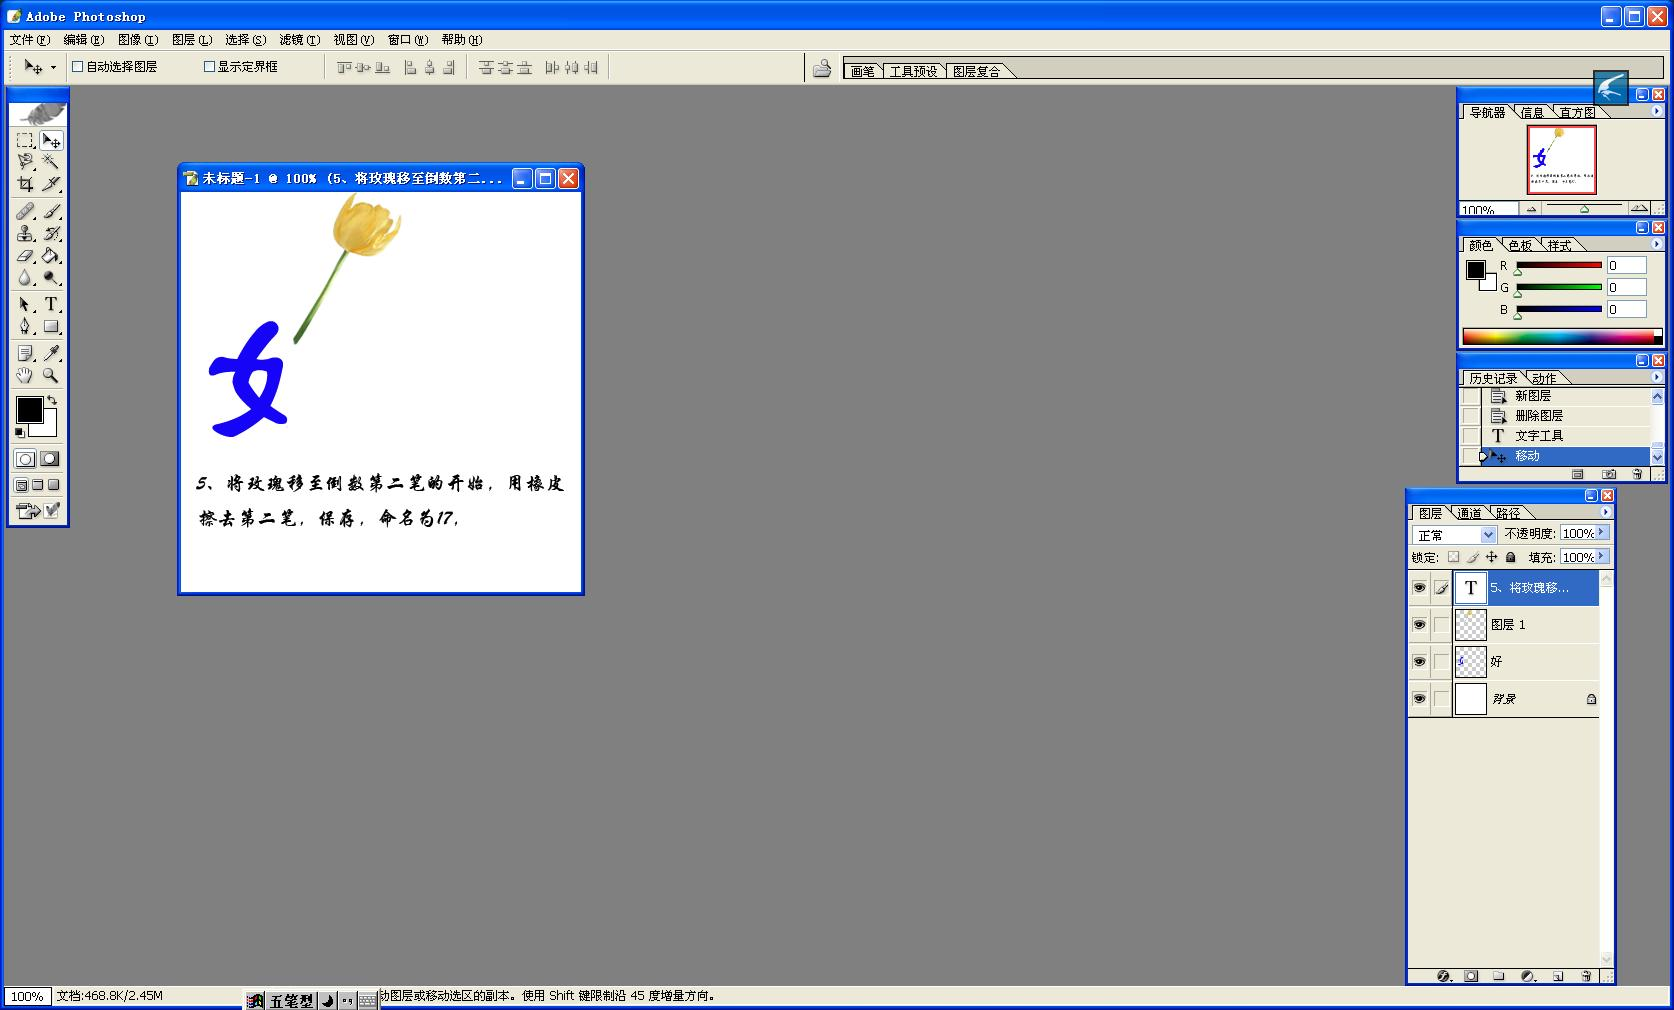 PS IR打造手写字的效果 GIF动画